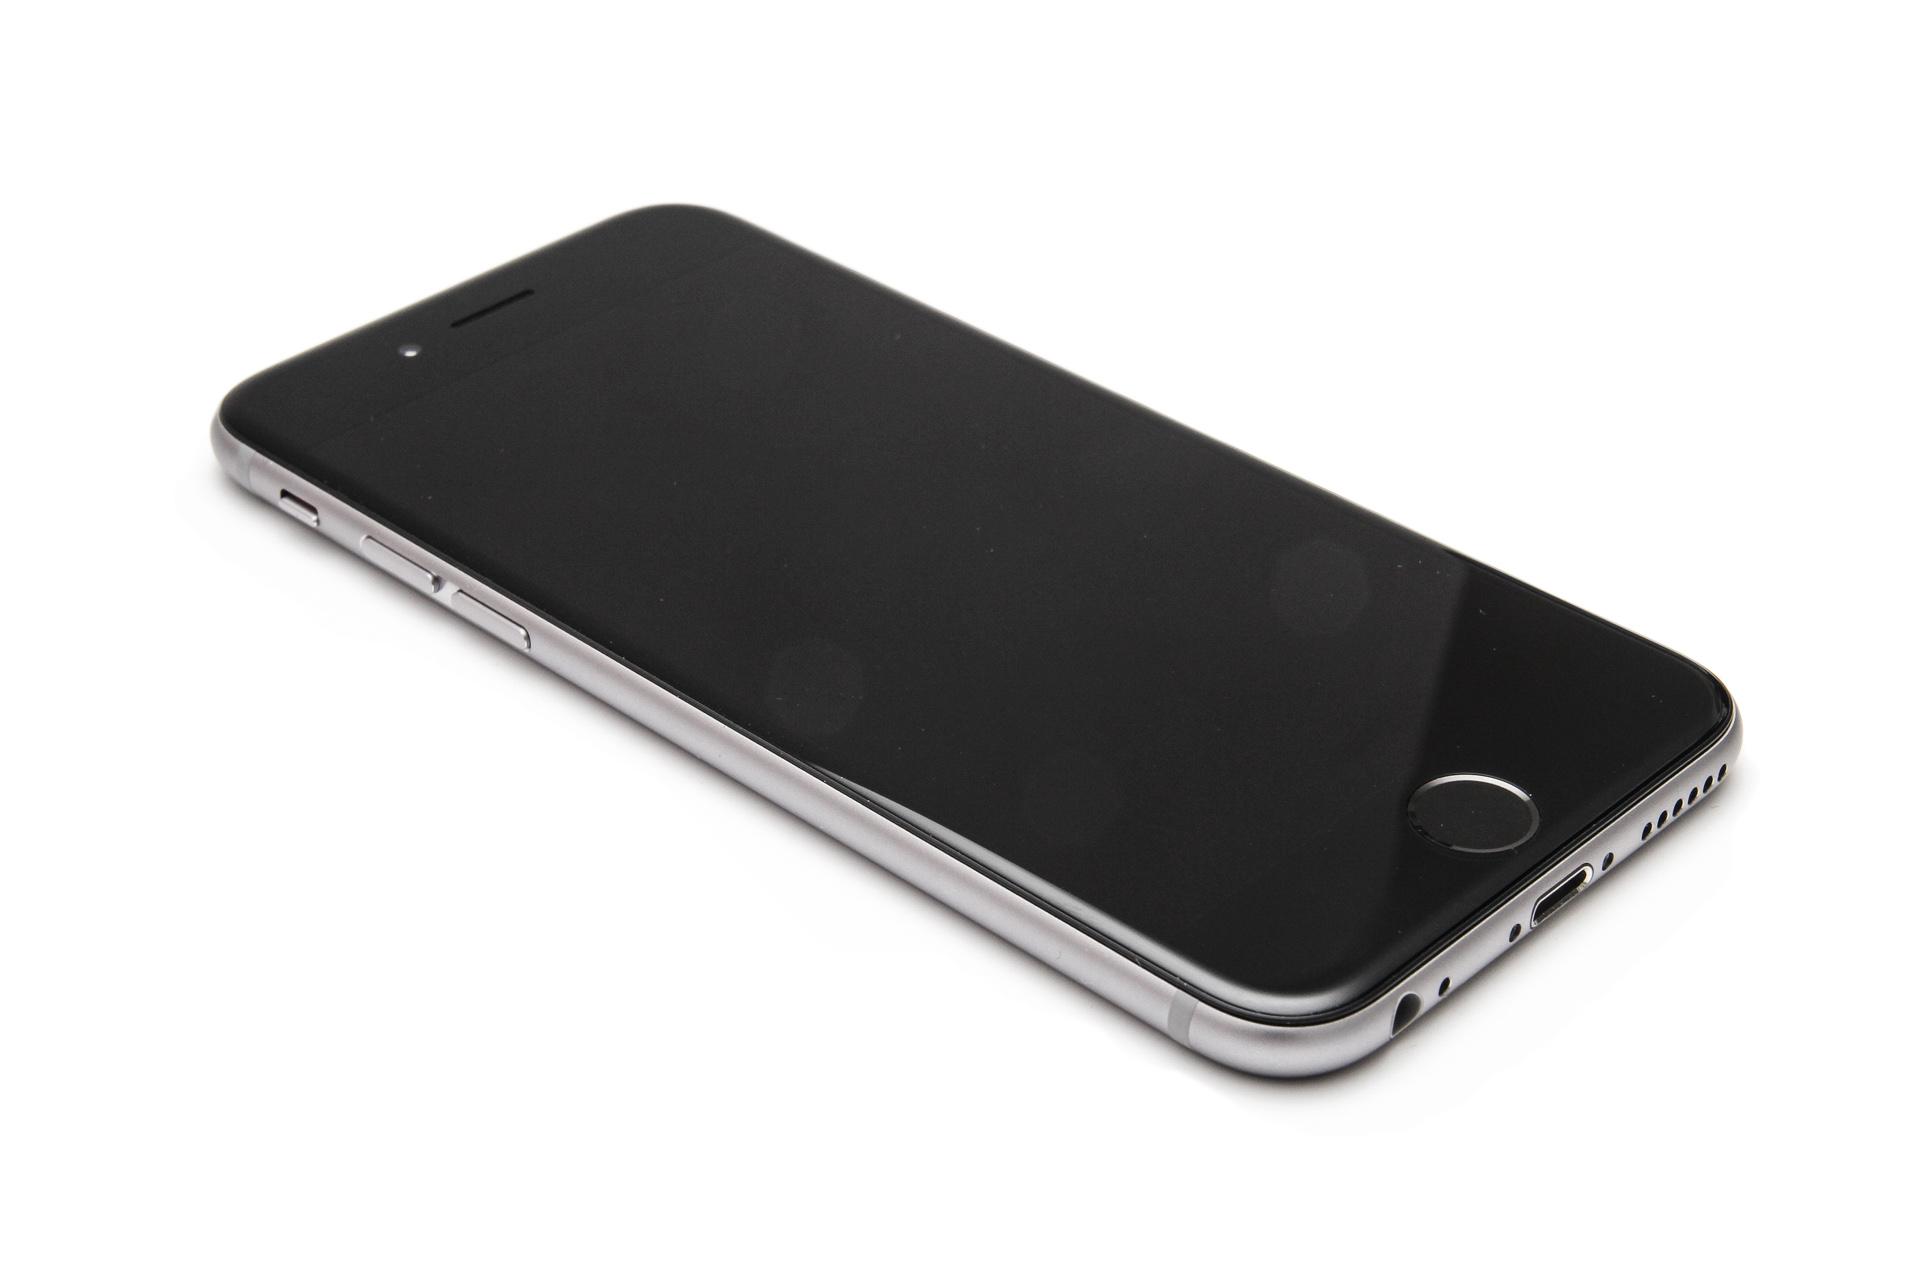 اپل آیفون 6 اس